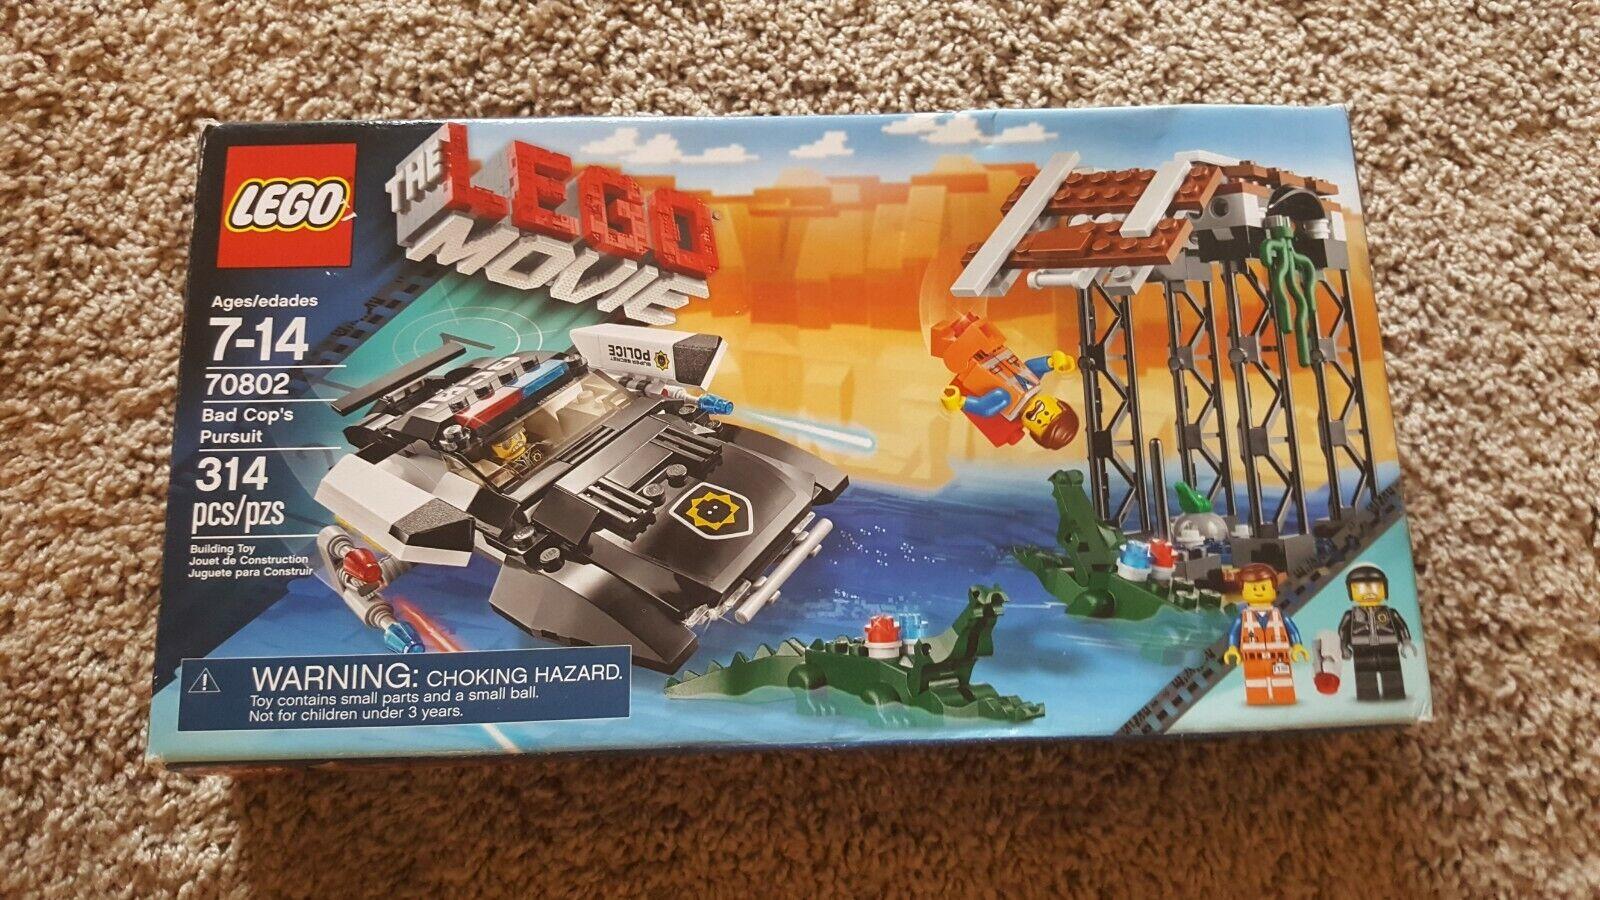 LEGO  The Lego Movie  70802 Bad Cop's Pursuit (Not Full)  è scontato